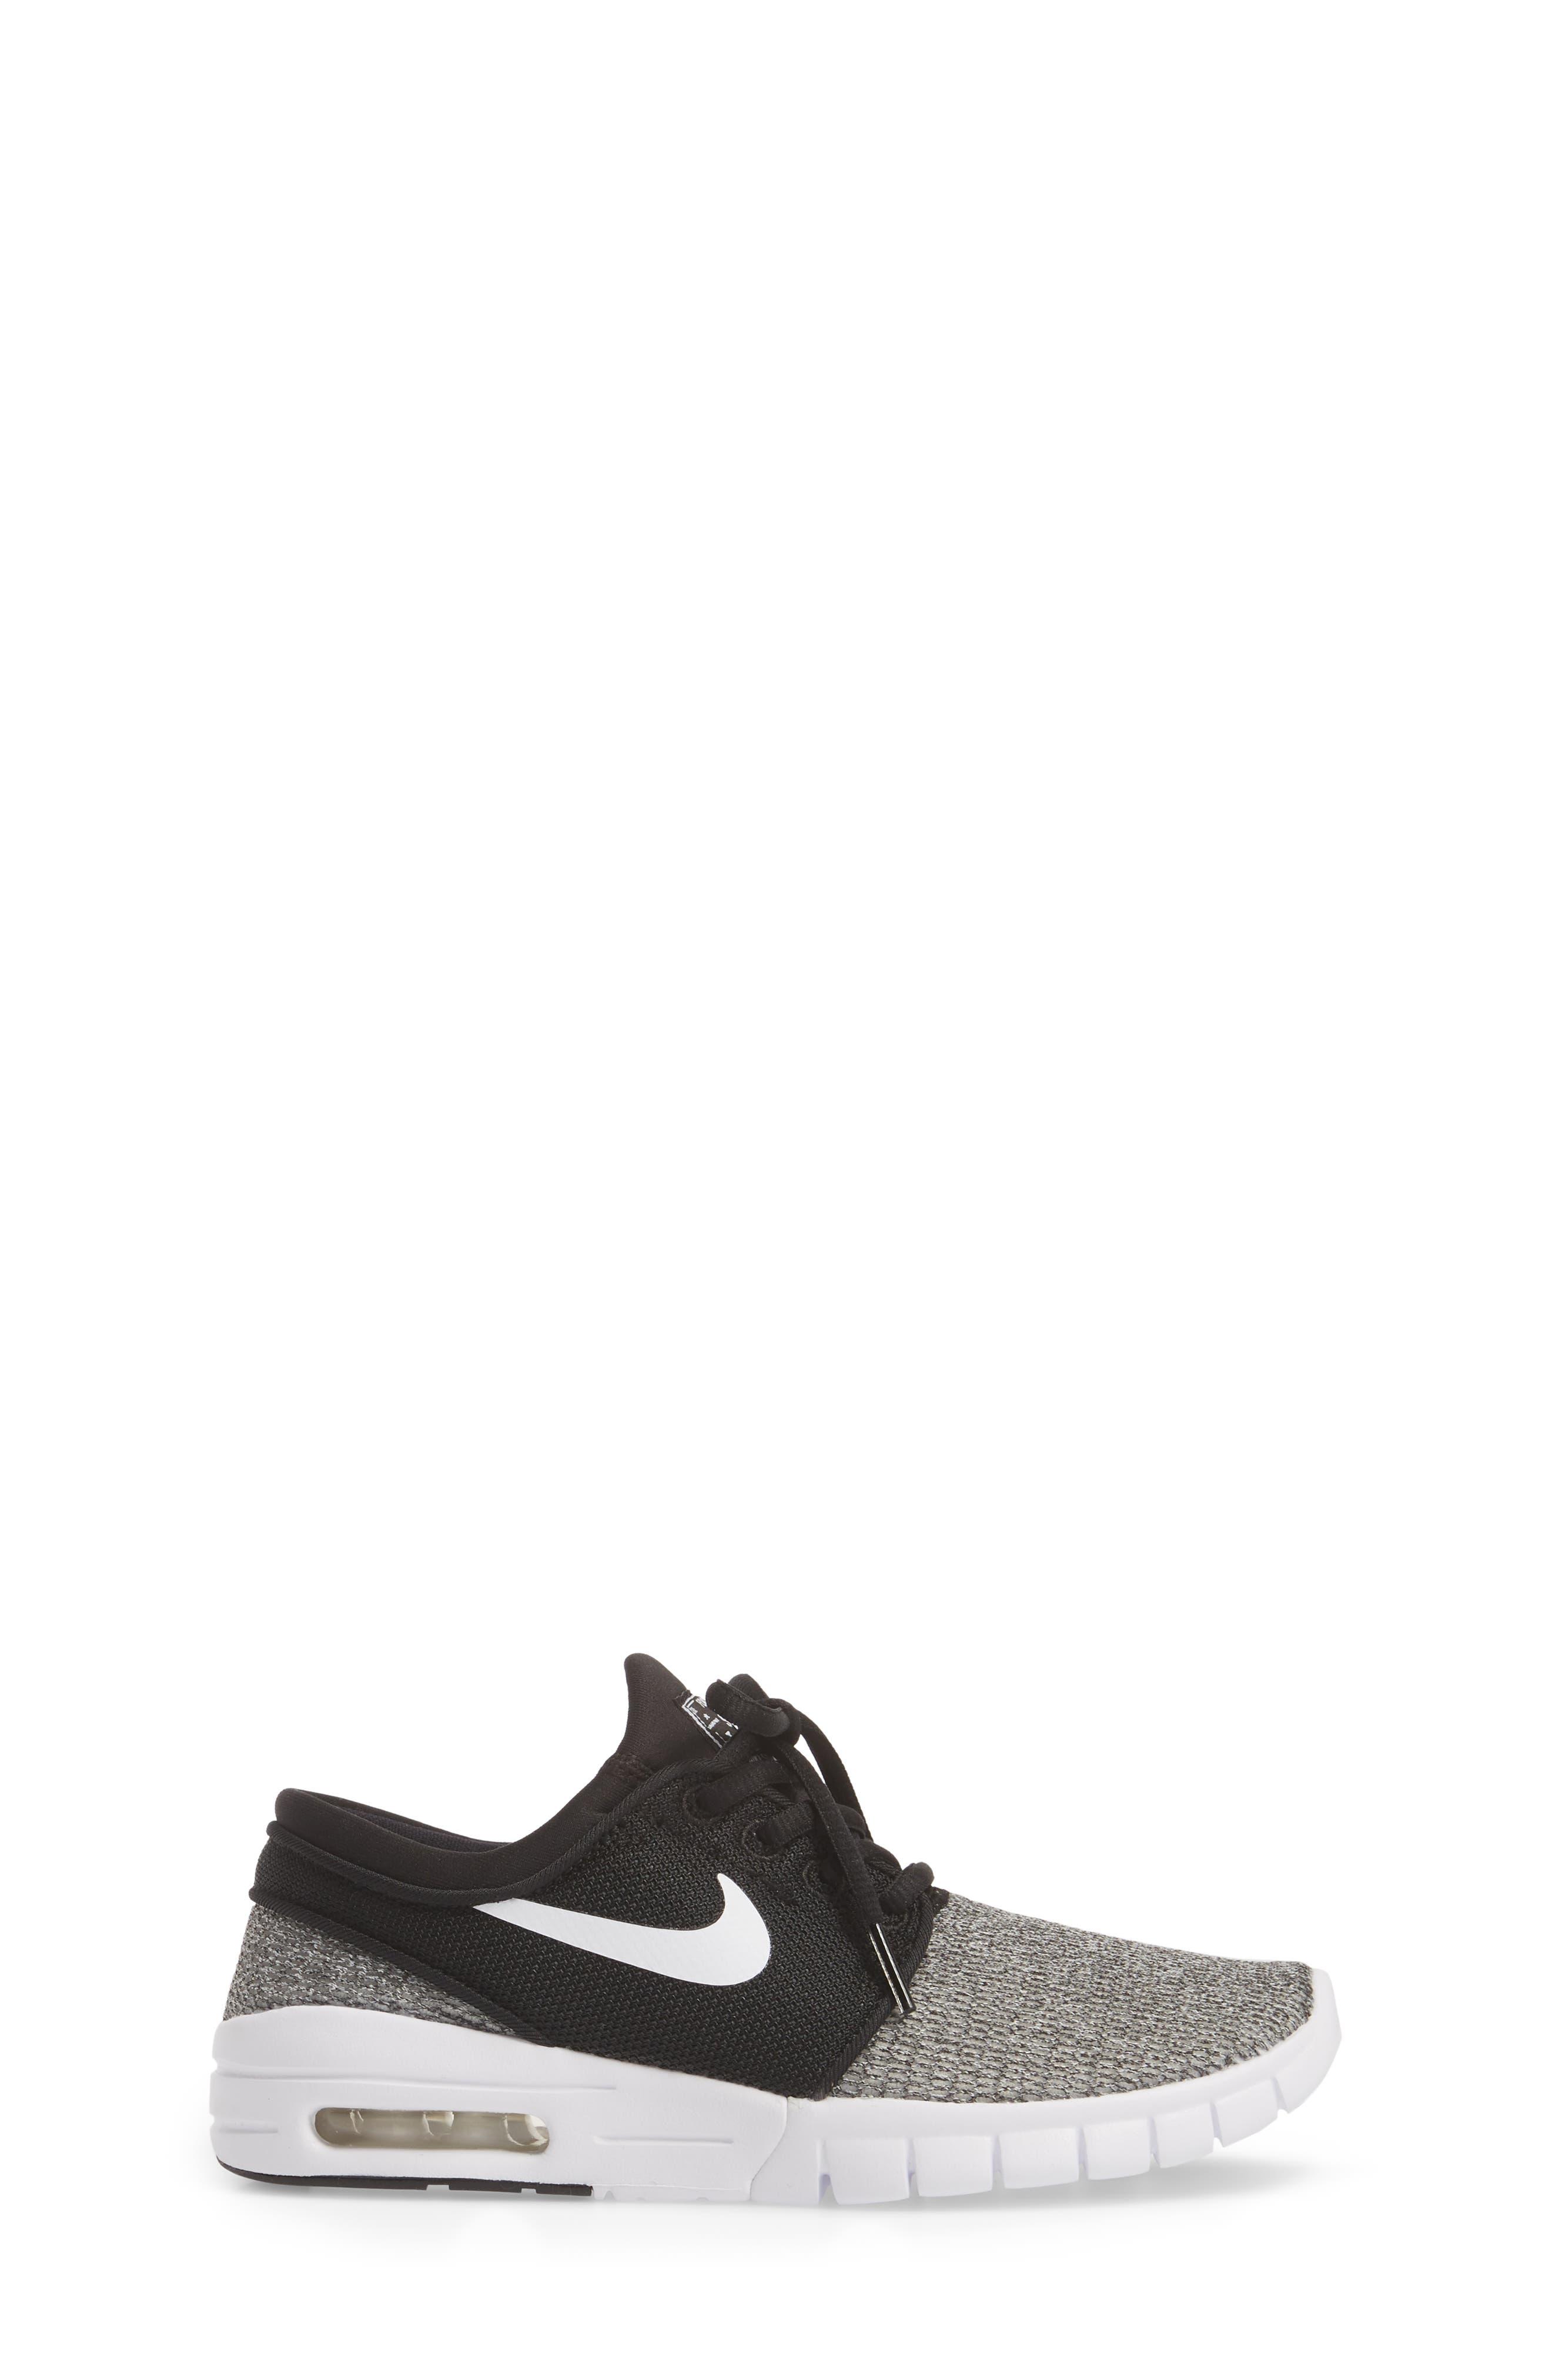 Stefan Janoski Max SB Skate Sneaker,                             Alternate thumbnail 3, color,                             Black/ White/ White